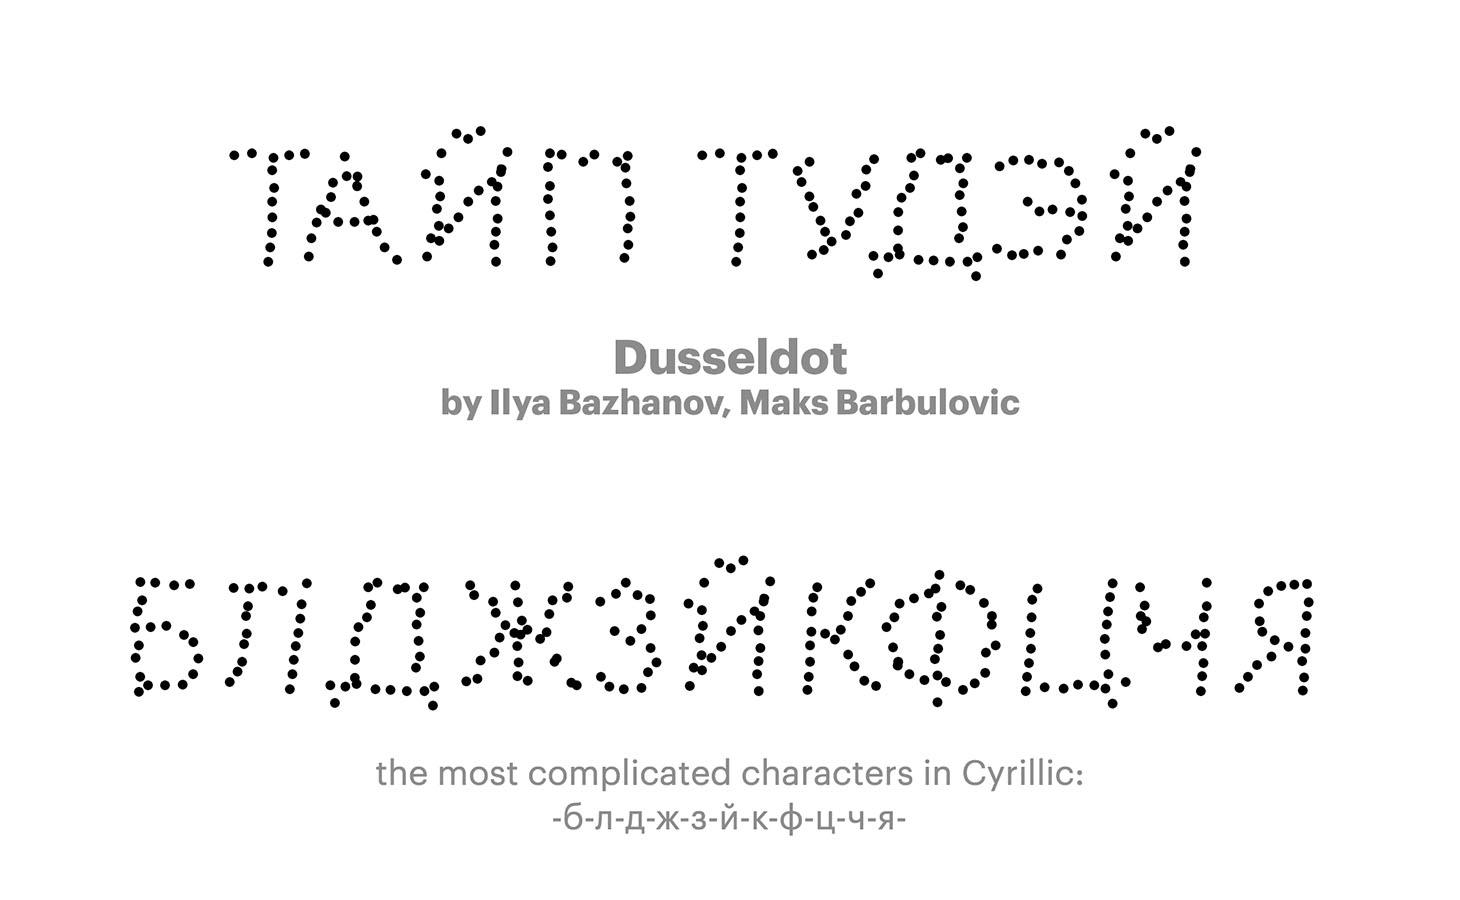 Dusseldot